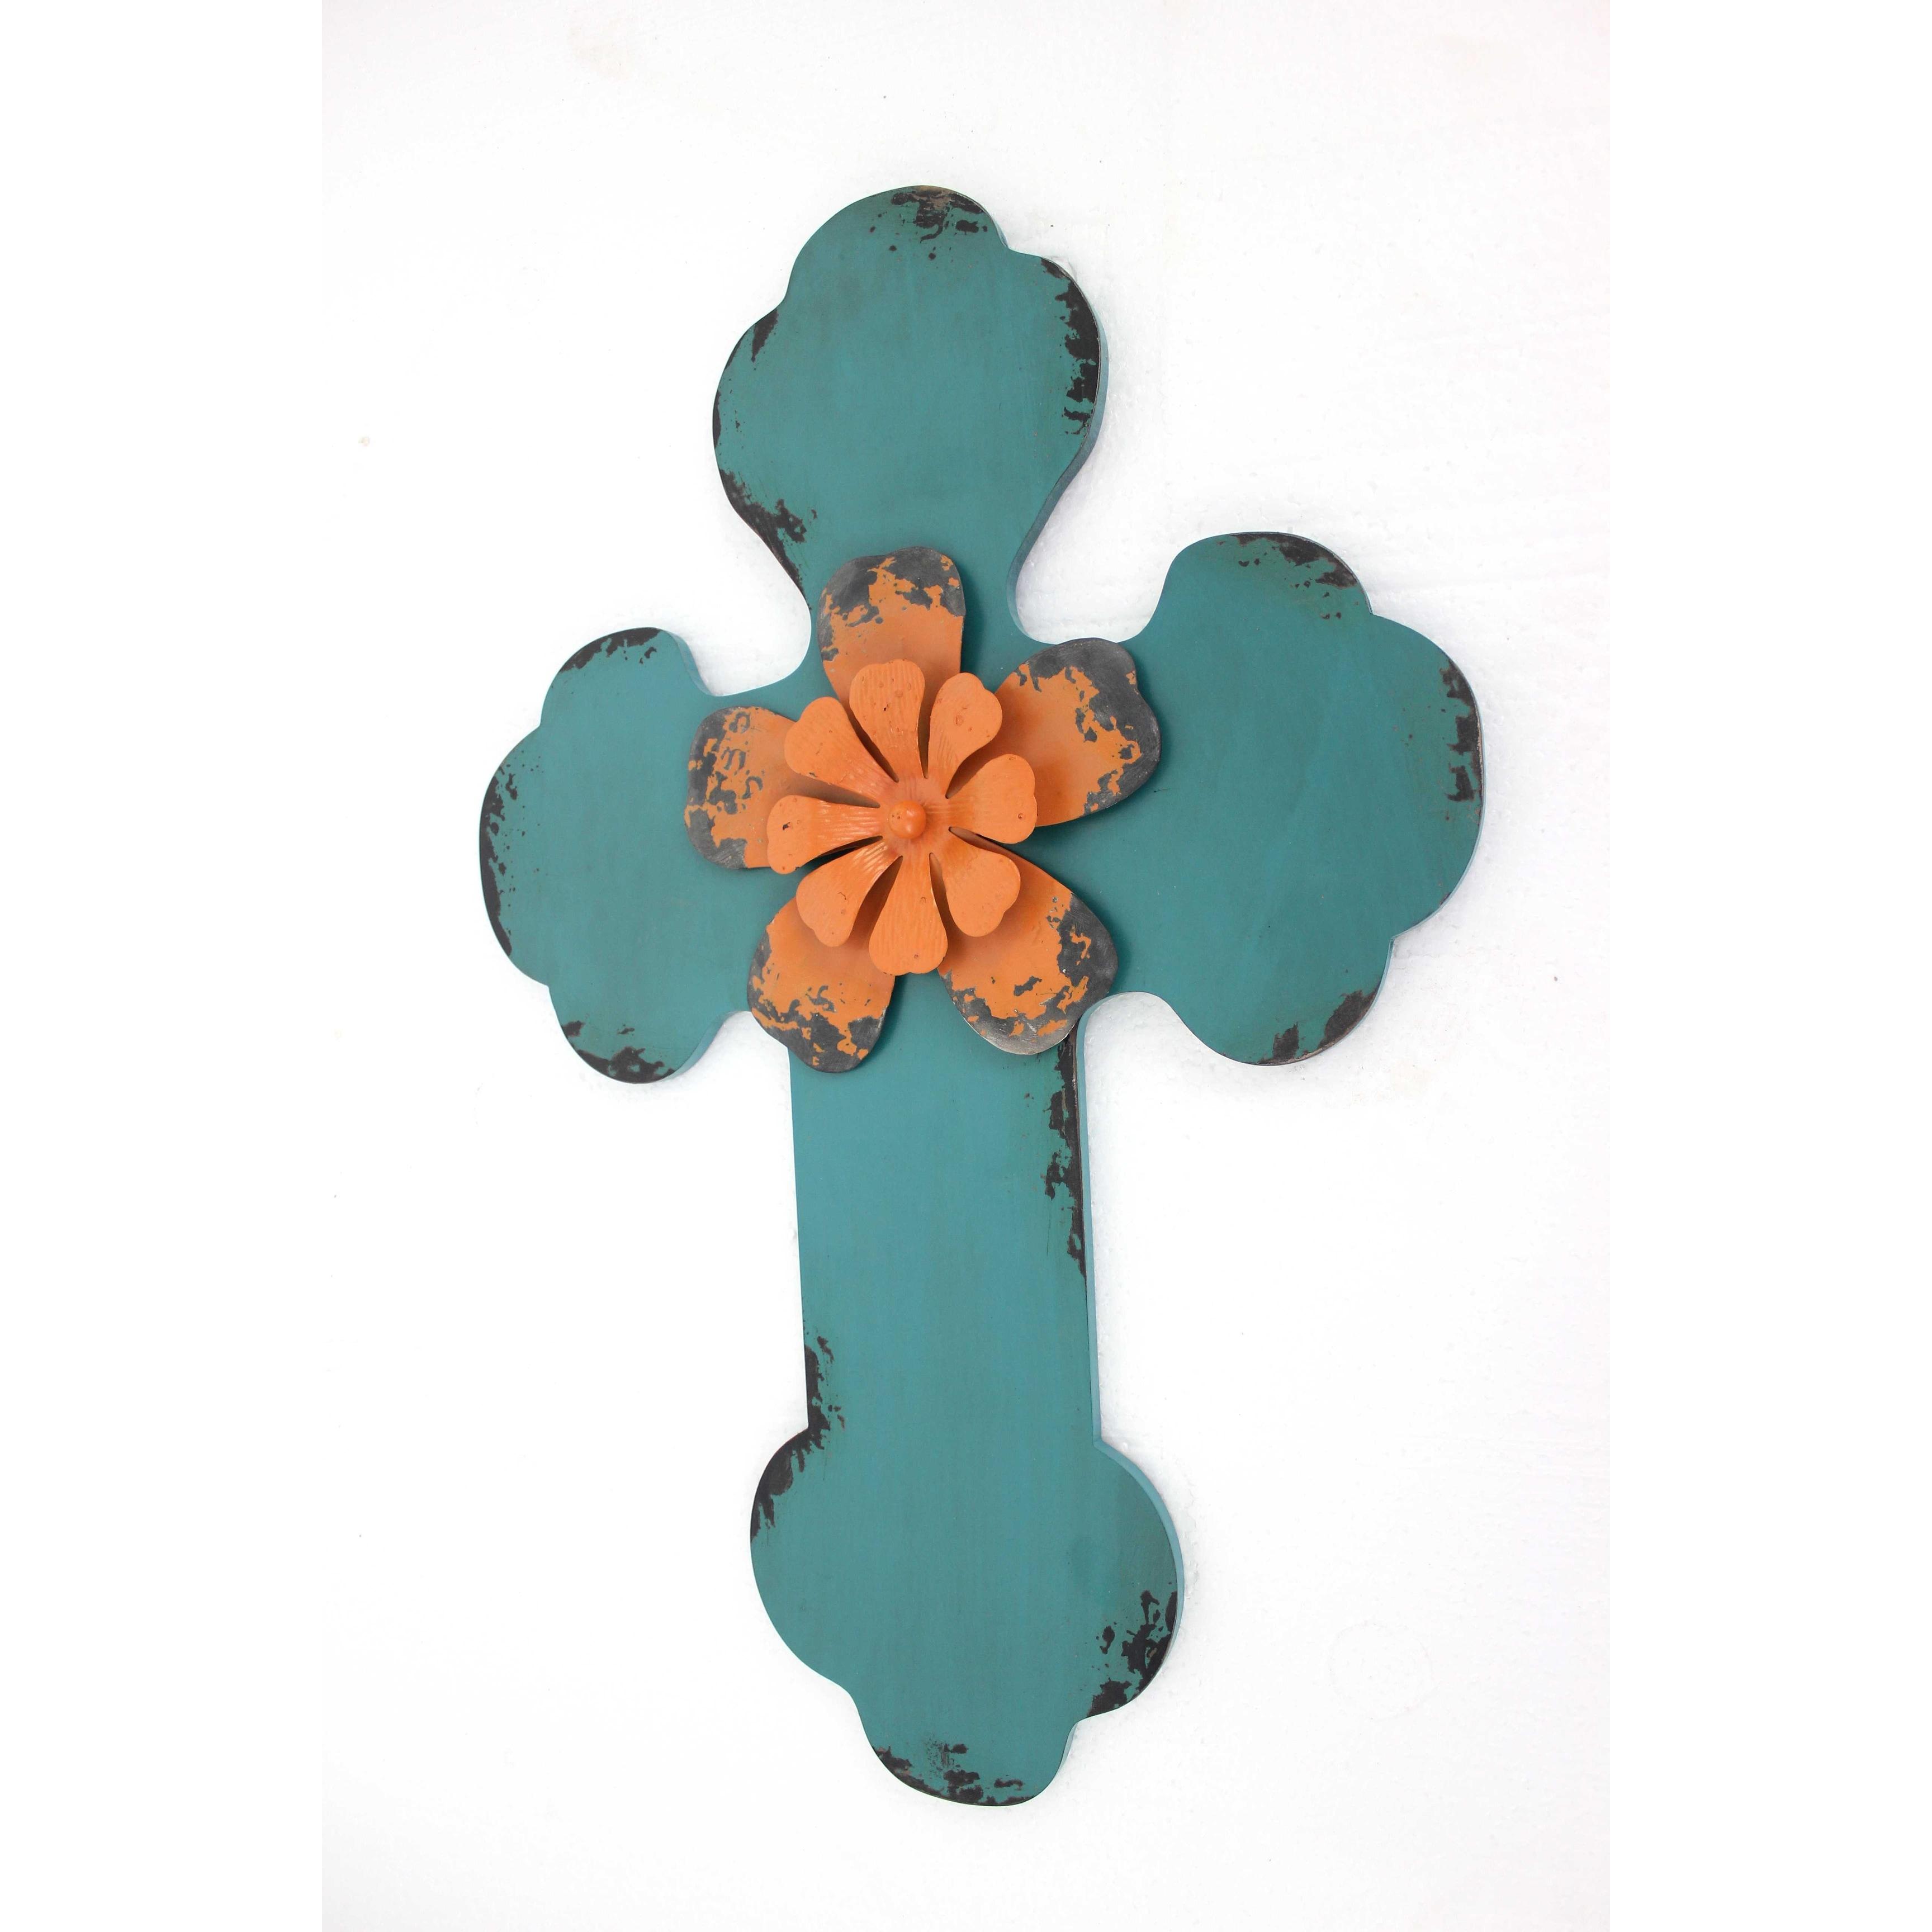 Rustic Blue Cross Wooden Wall Decor